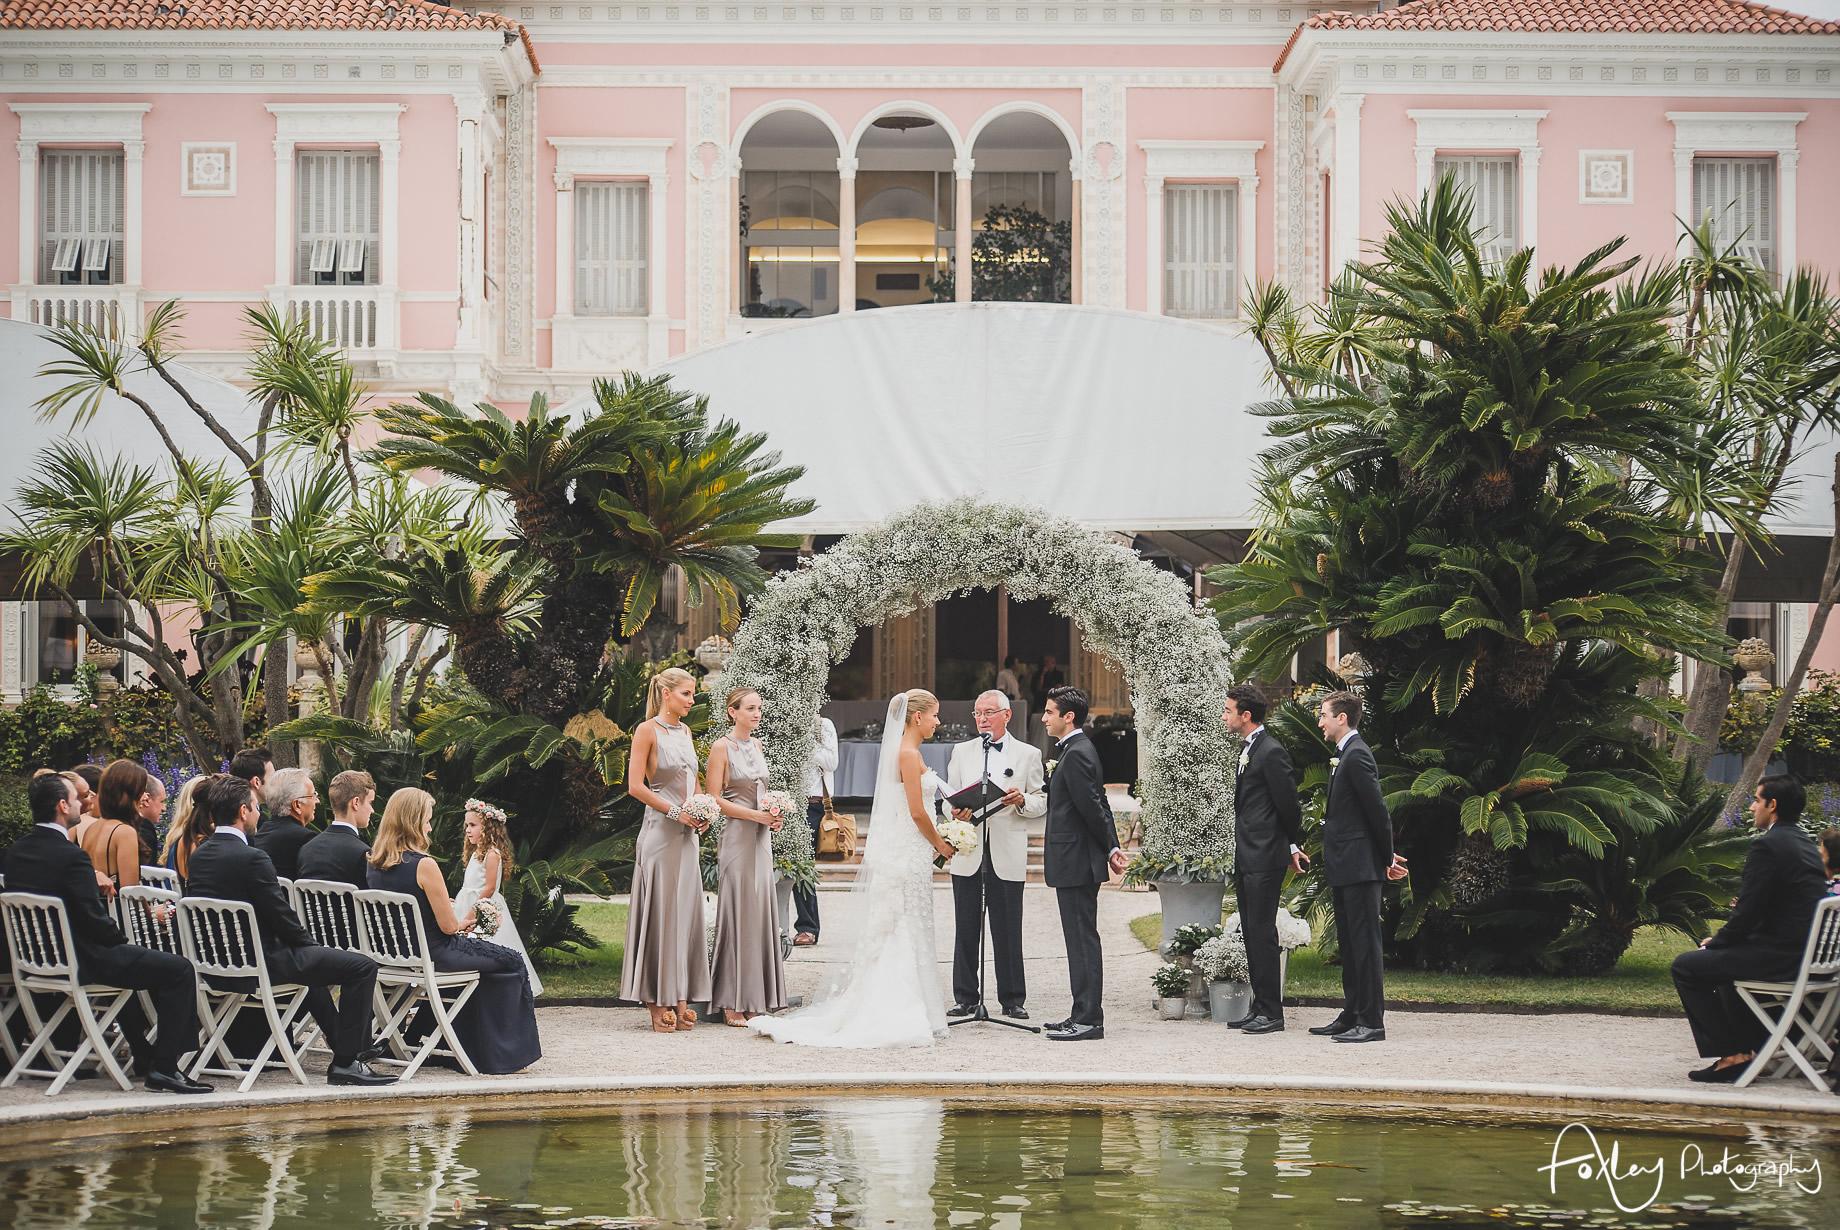 Jil and Will's Wedding at Villa Ephrussi De Rothschild 096